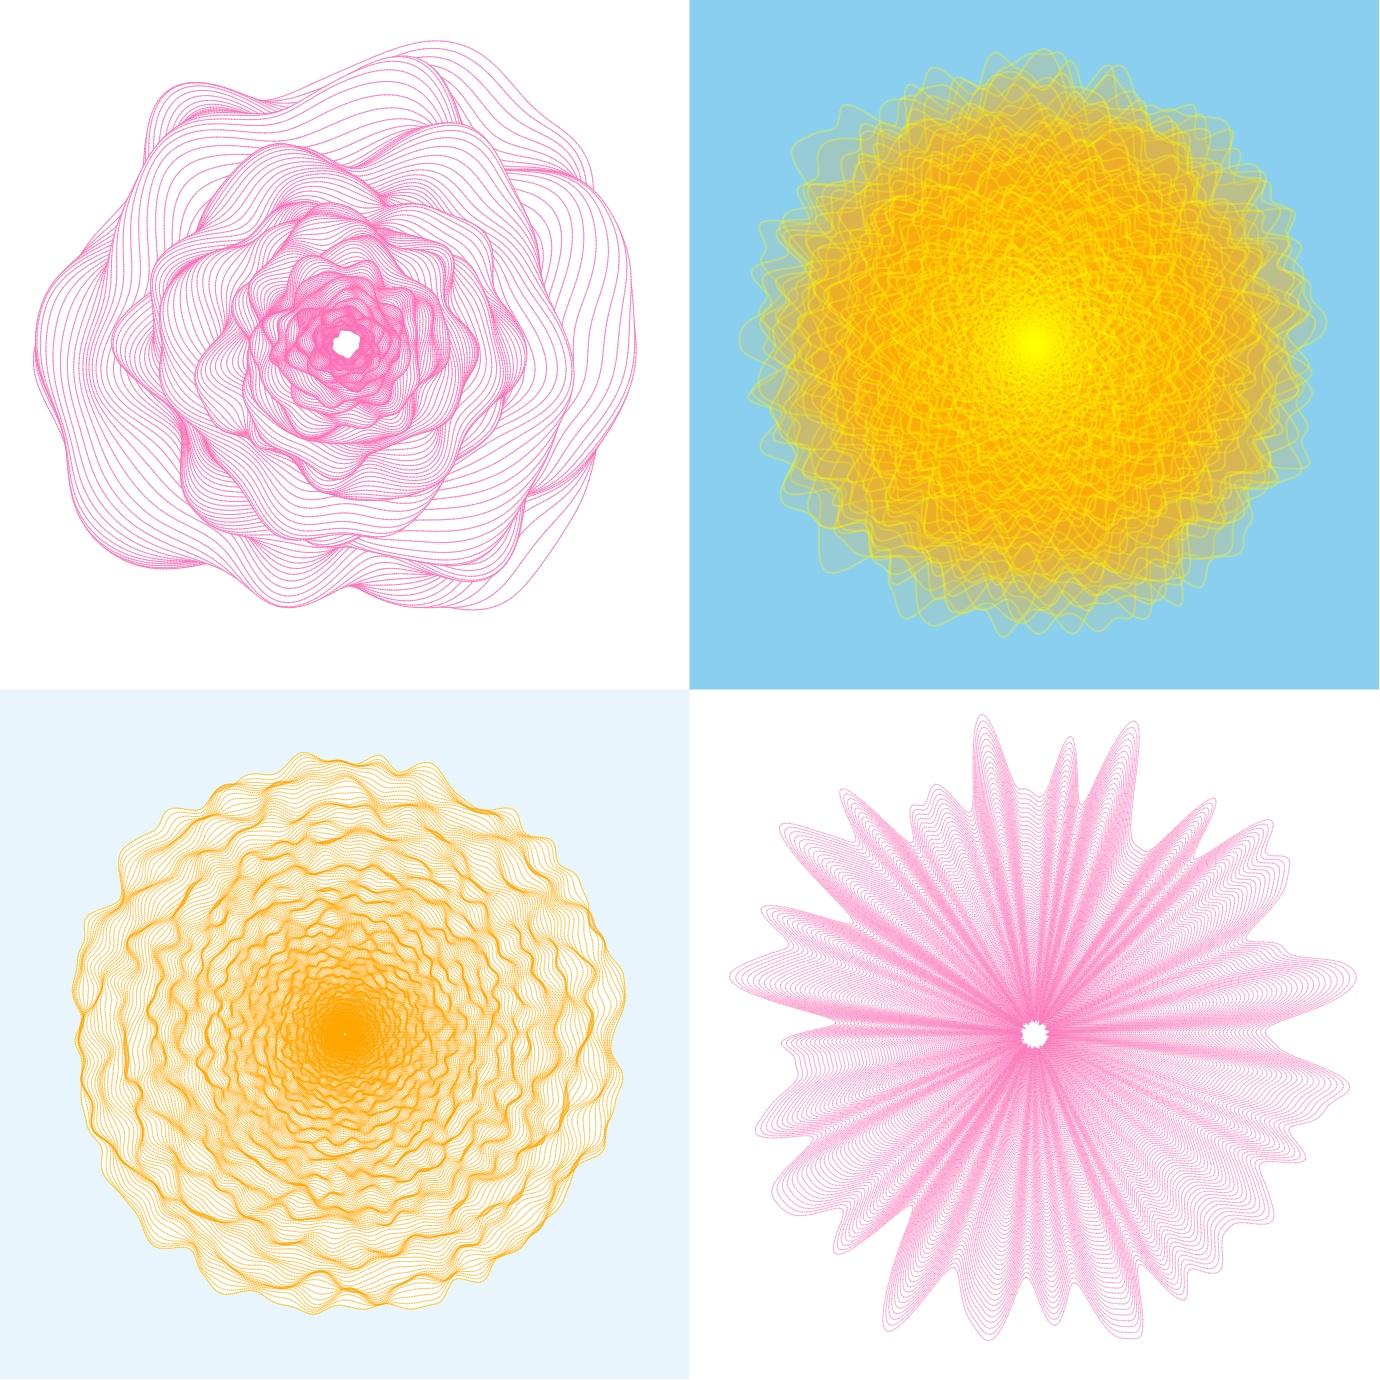 Generating Flowers Using Simplex Noise